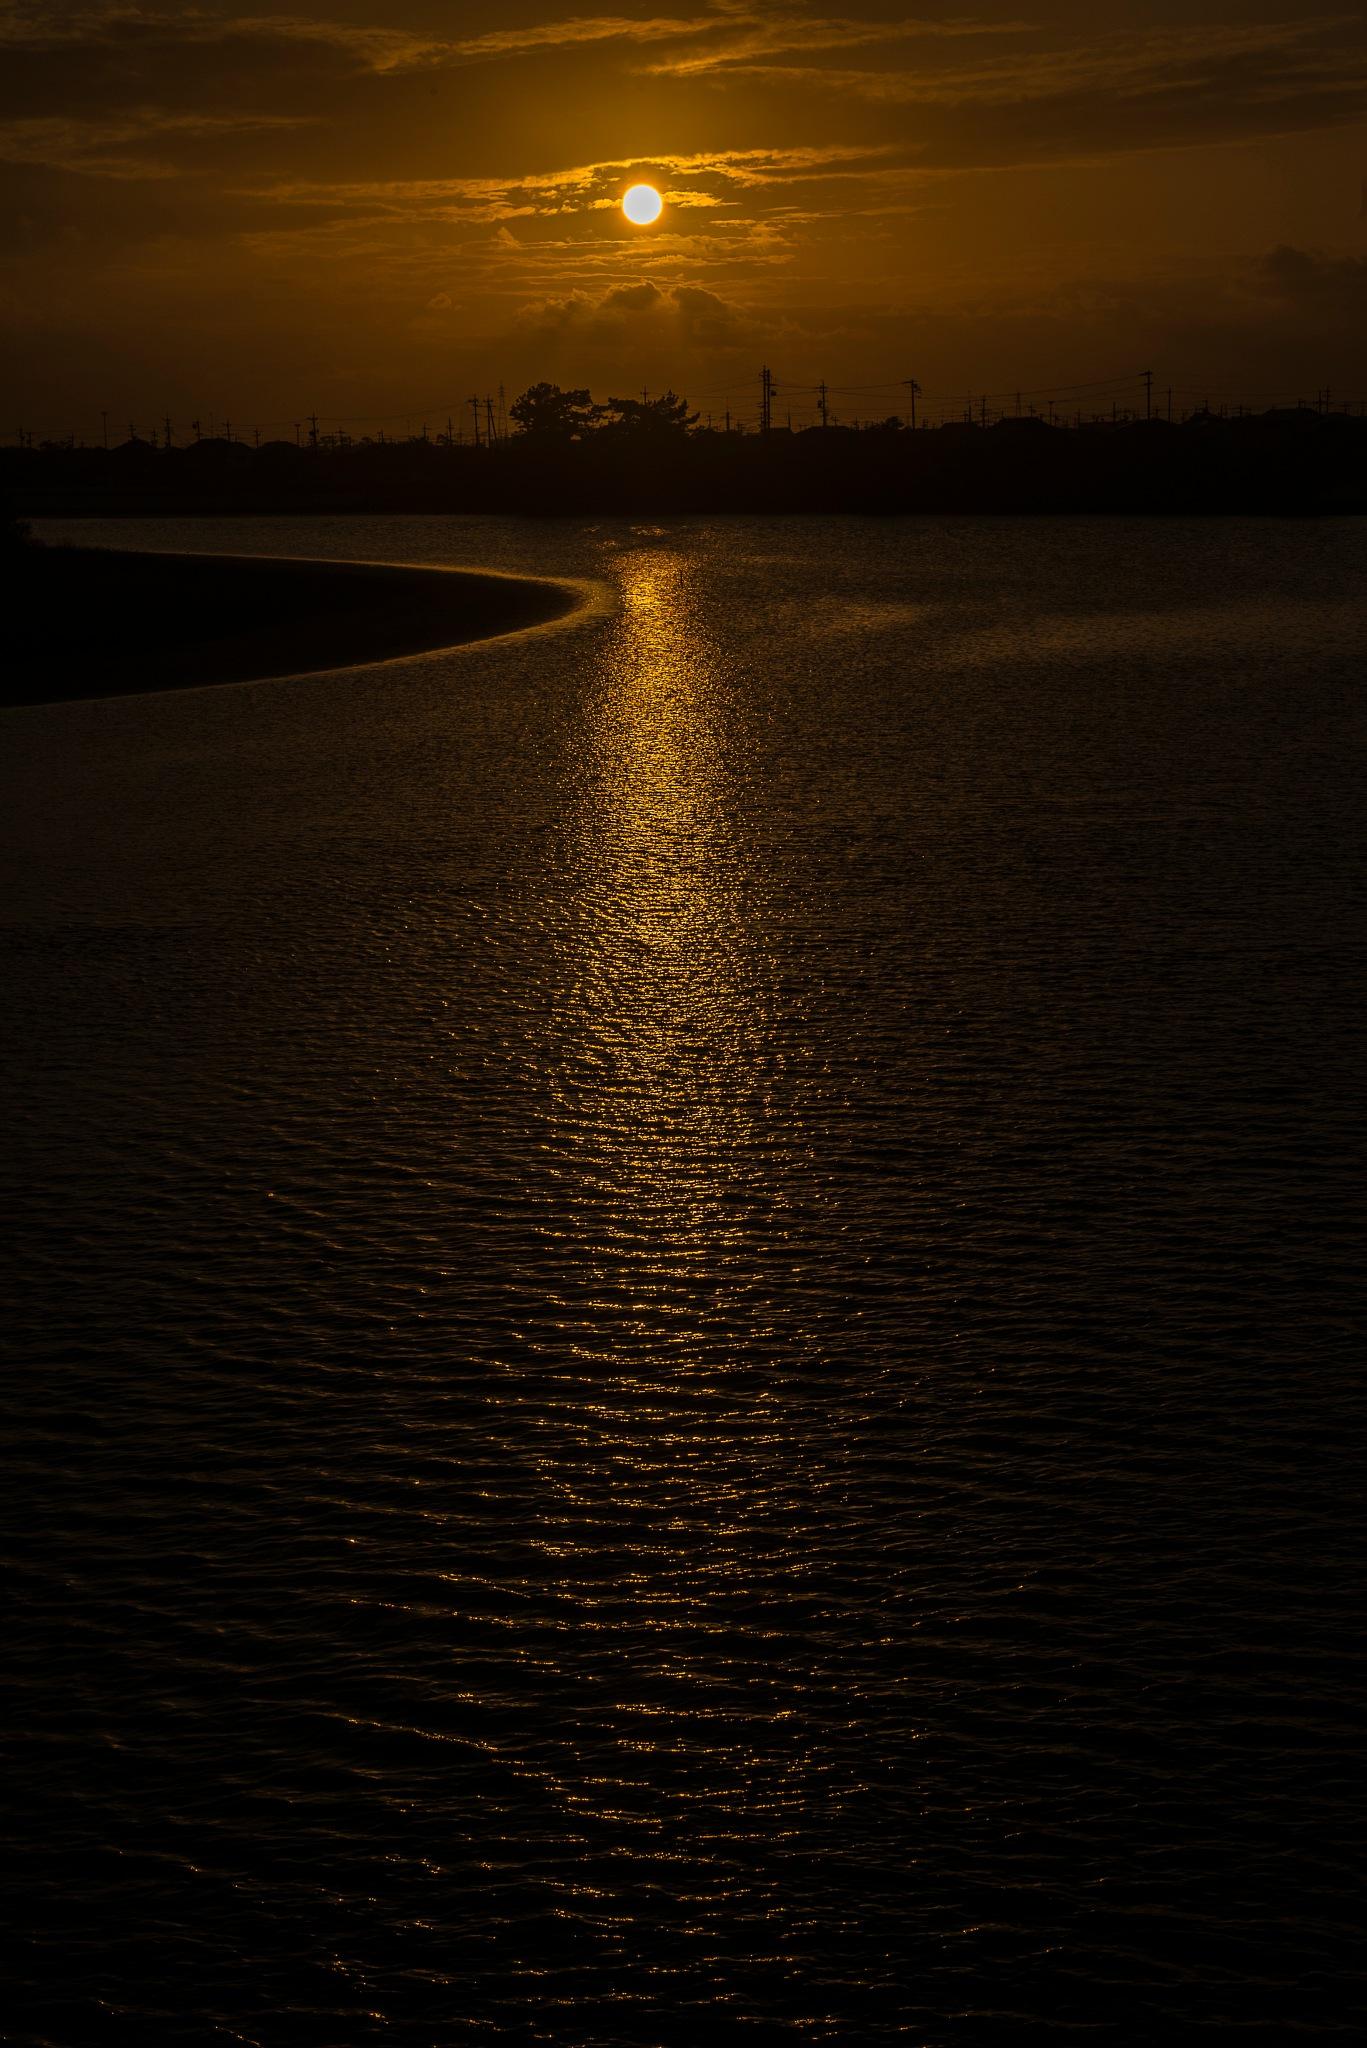 Sundown (Ota river) by 工藤 省三